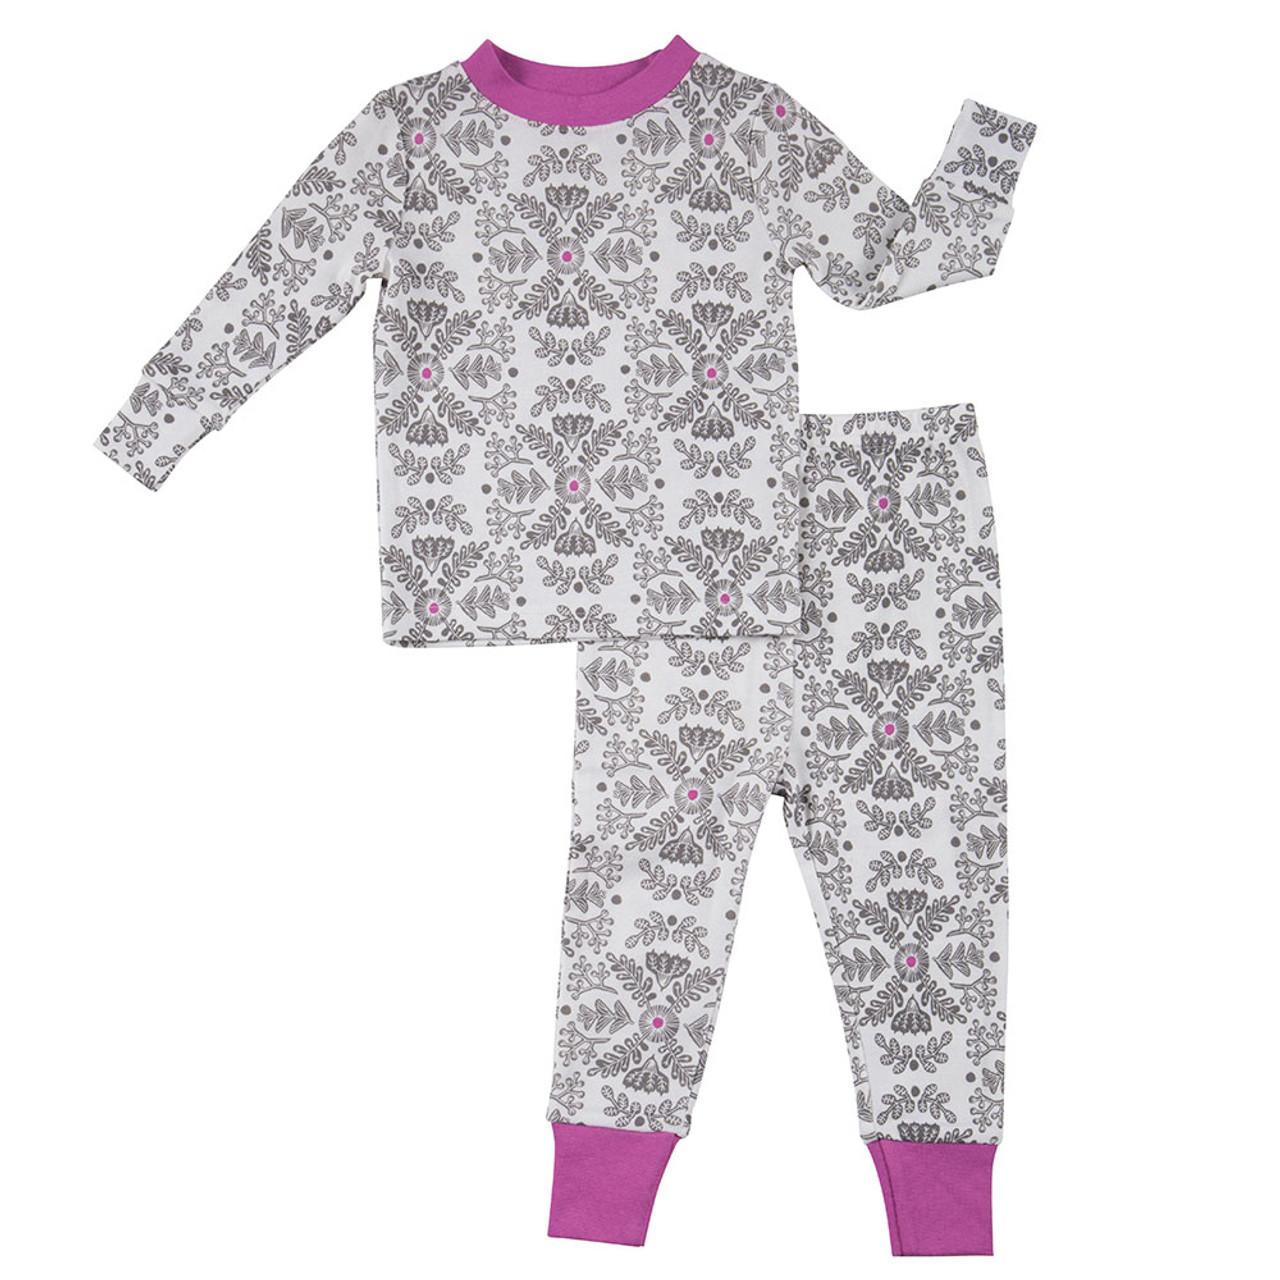 Robeez Floral Sleepwear Set - Front a7b7a5561